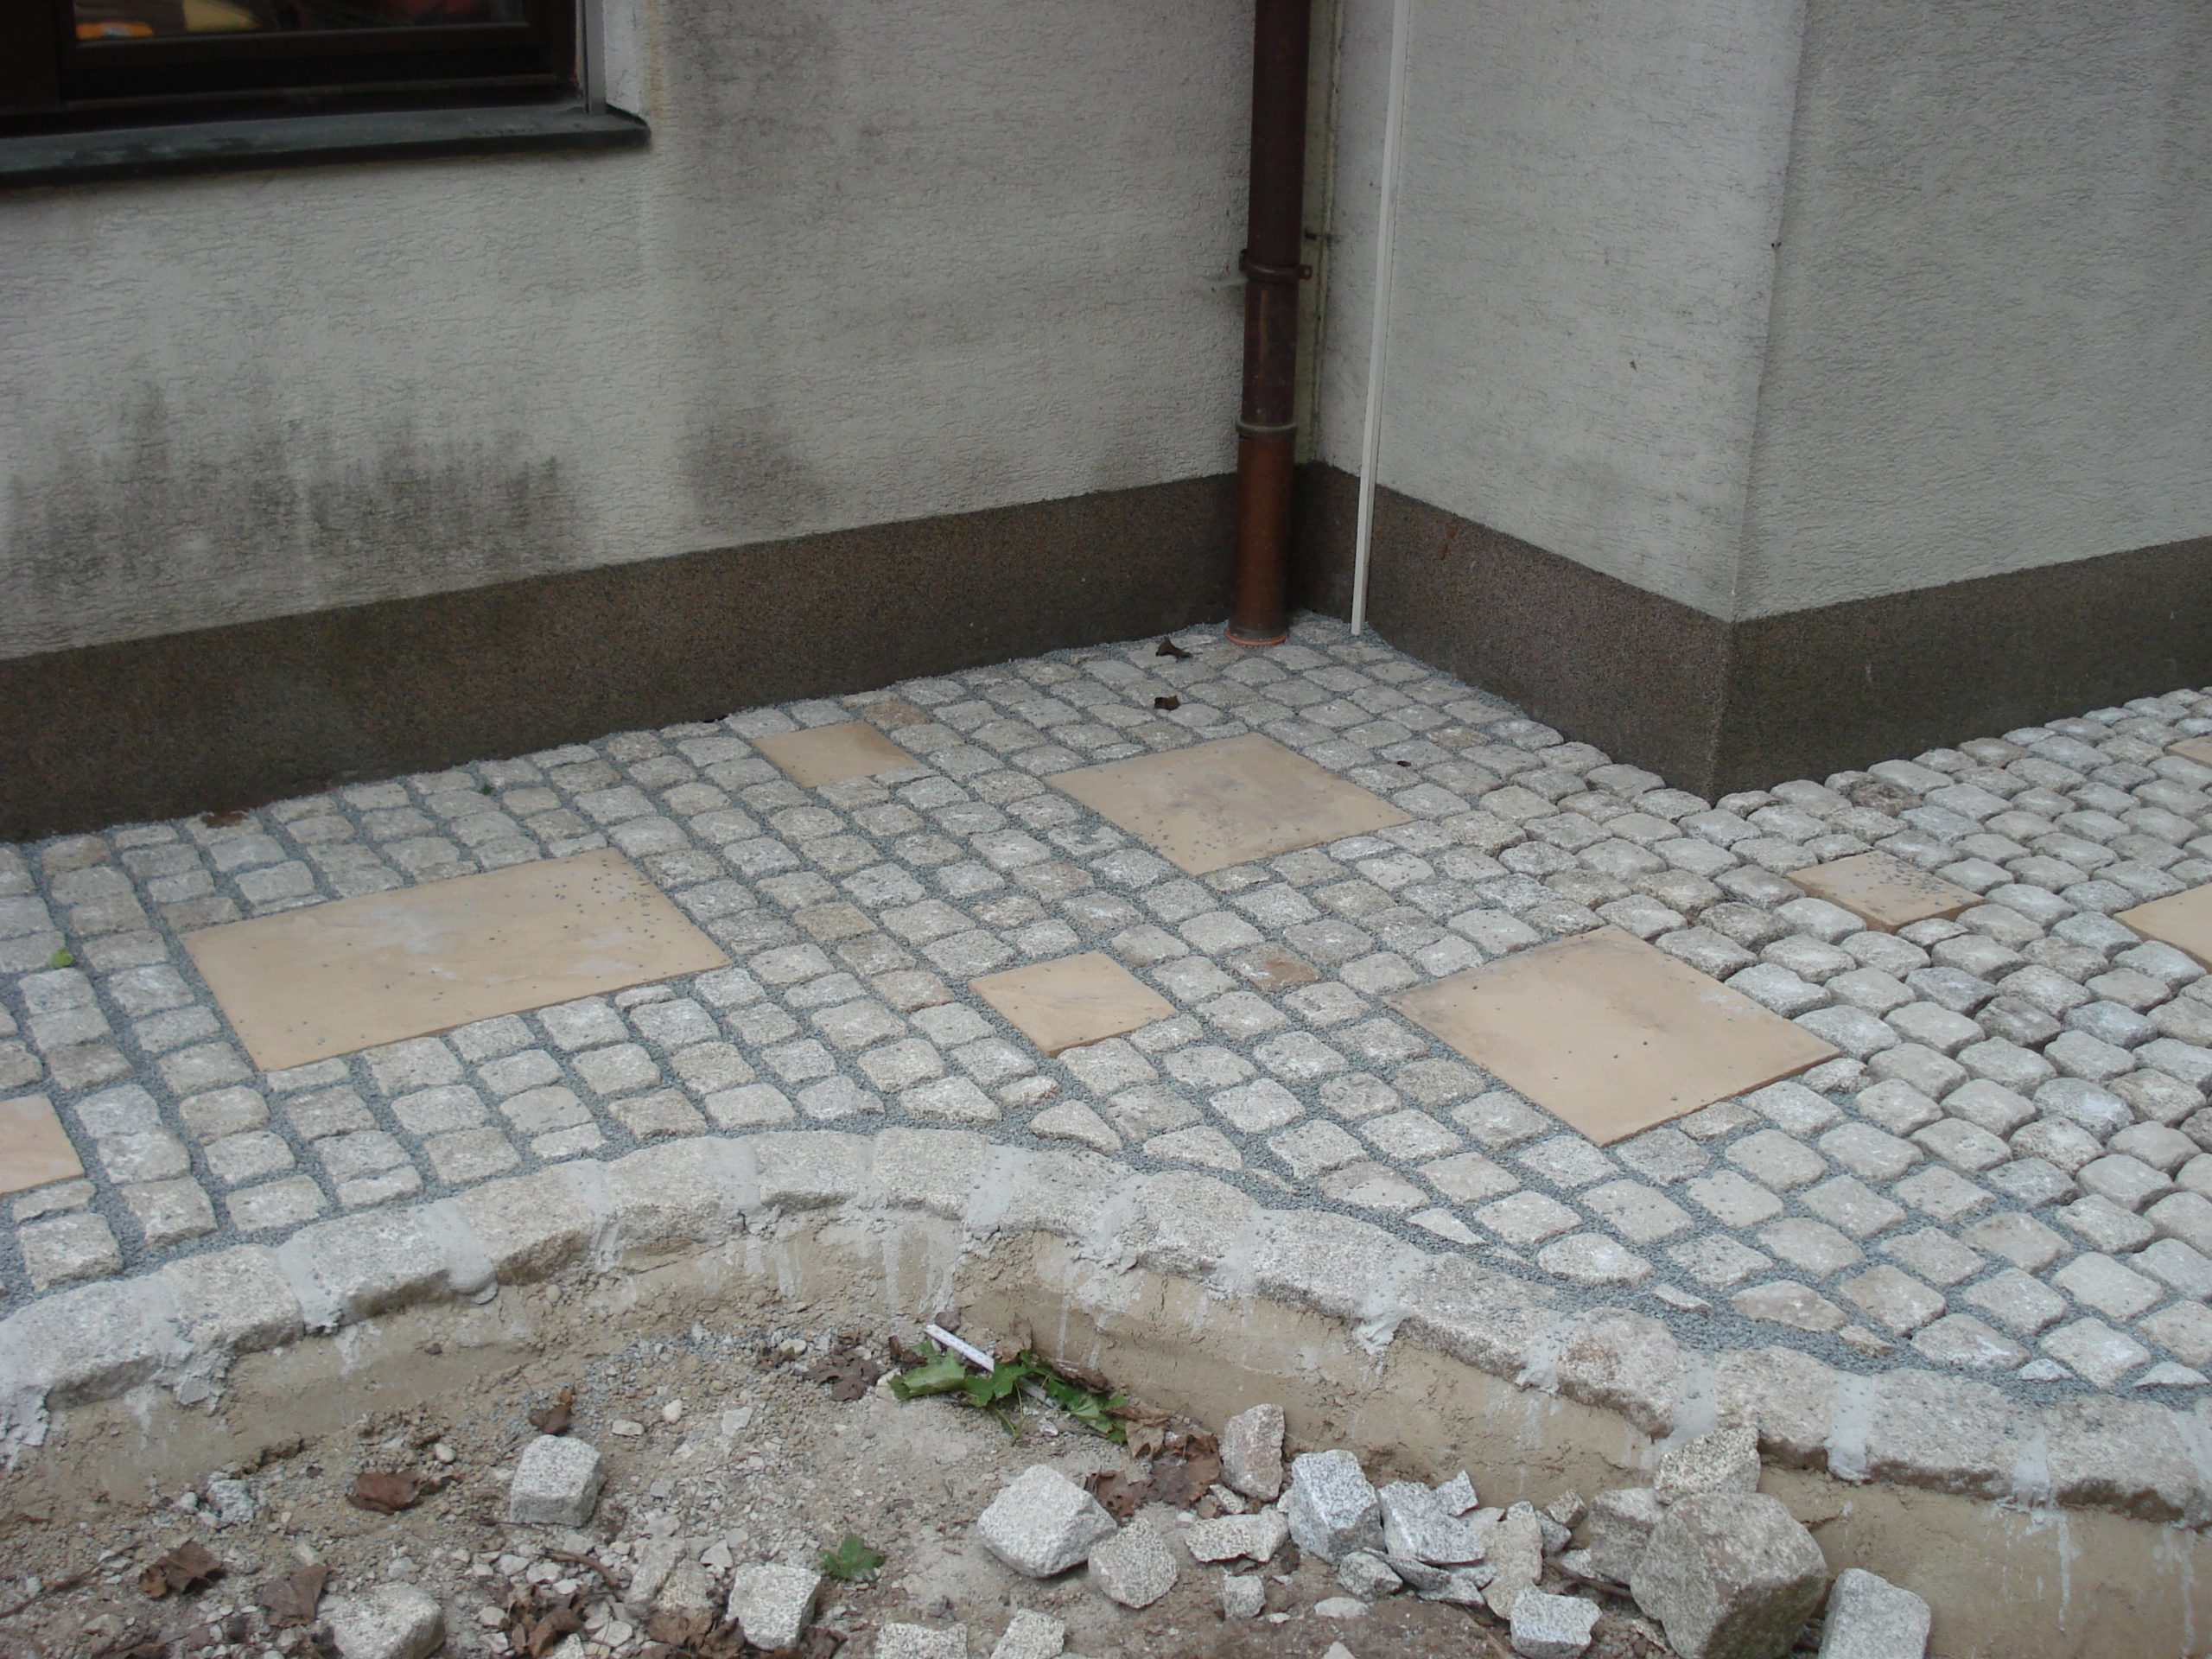 Granitpflaster 10x10cm mit Betonplatten 60x40,40x40,20x20cm